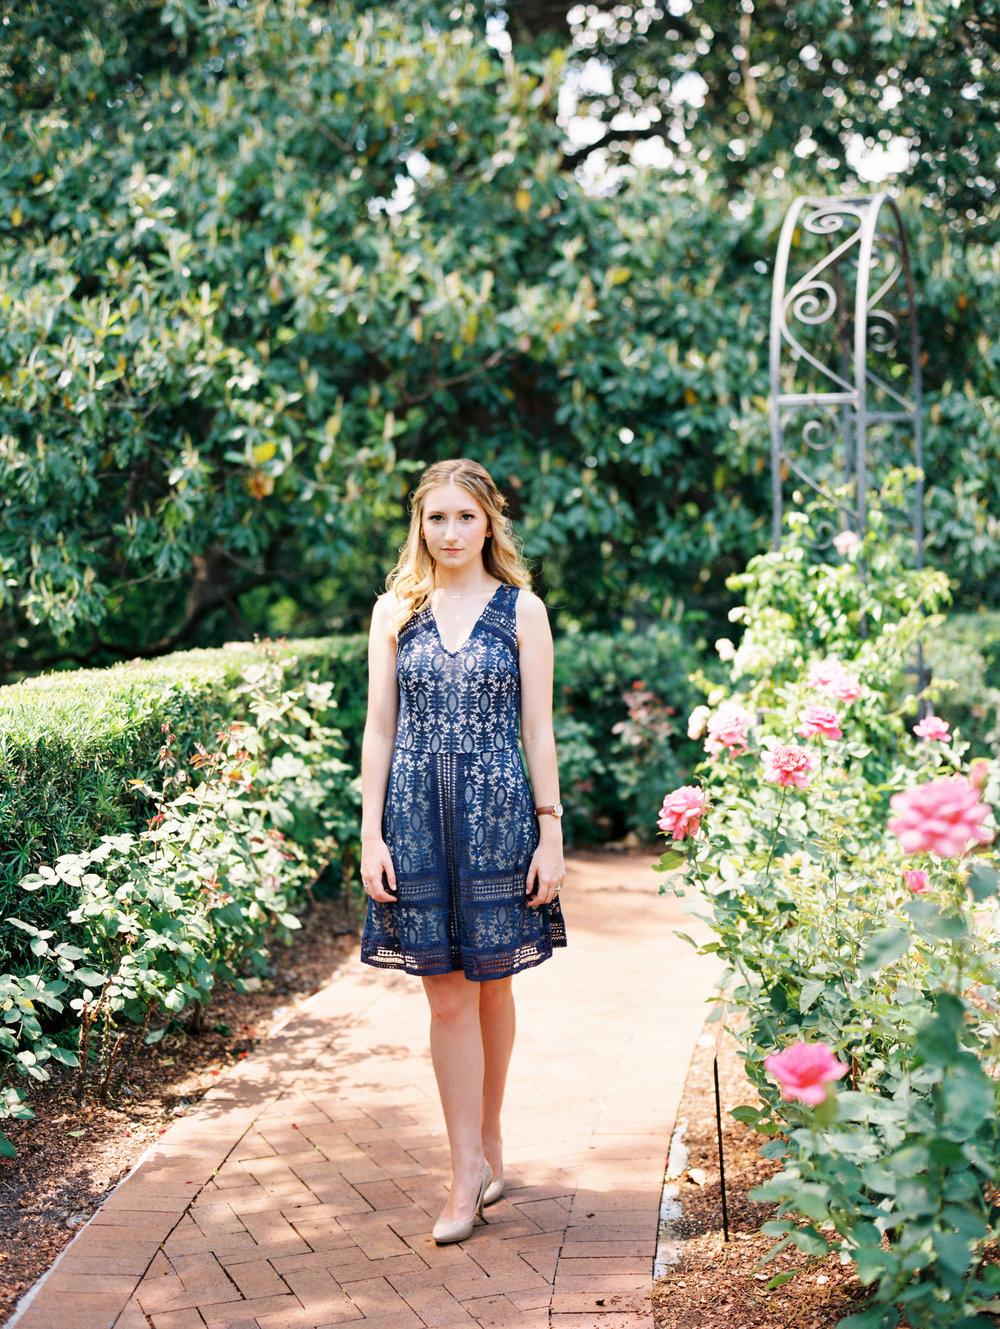 dallas-texas-dallas-arboretum-botanical-garden-senior-portraits-ar-photography-claire-289.jpg